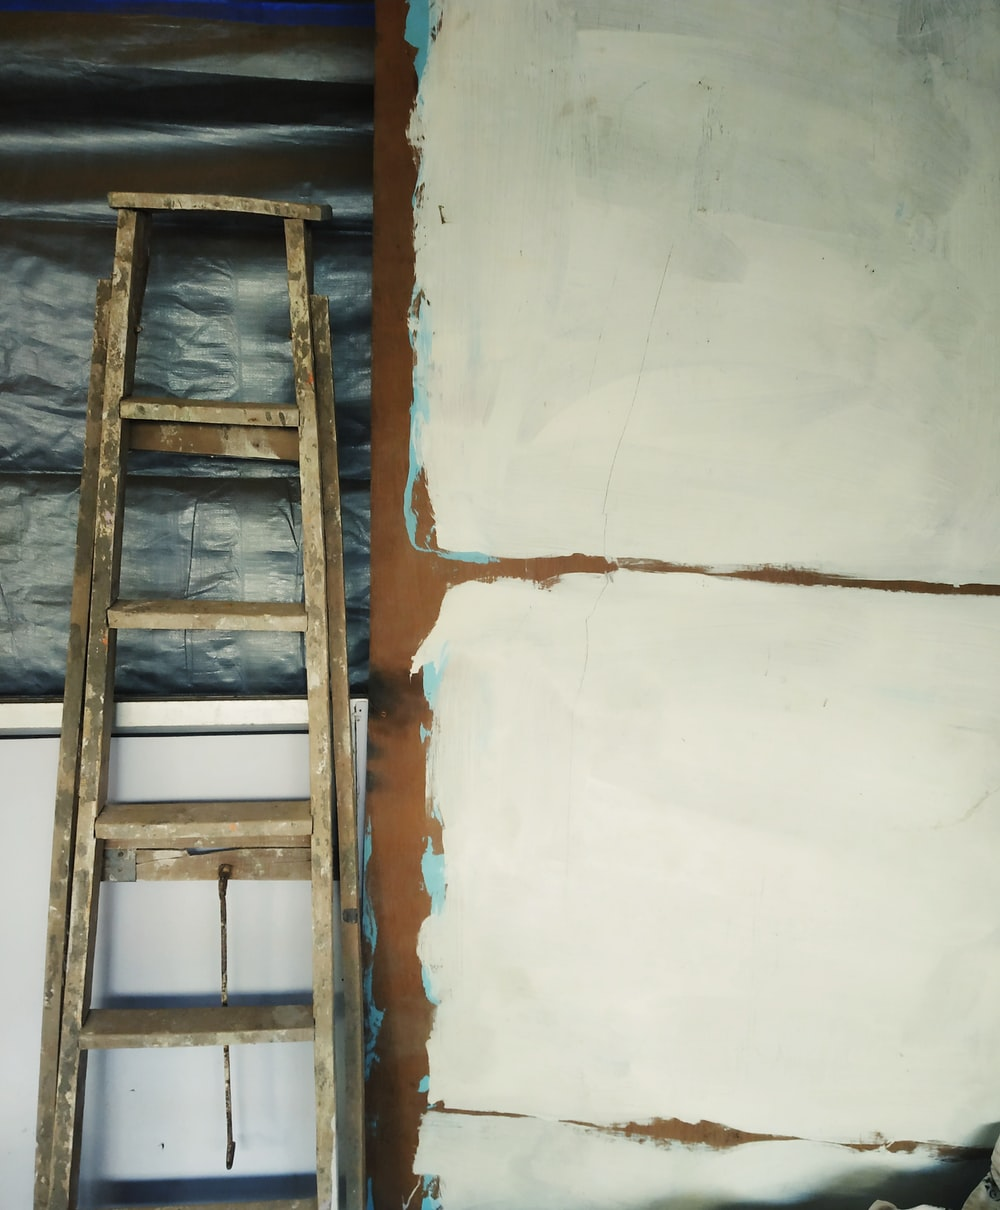 gray wooden ladder leaned on white cabinet